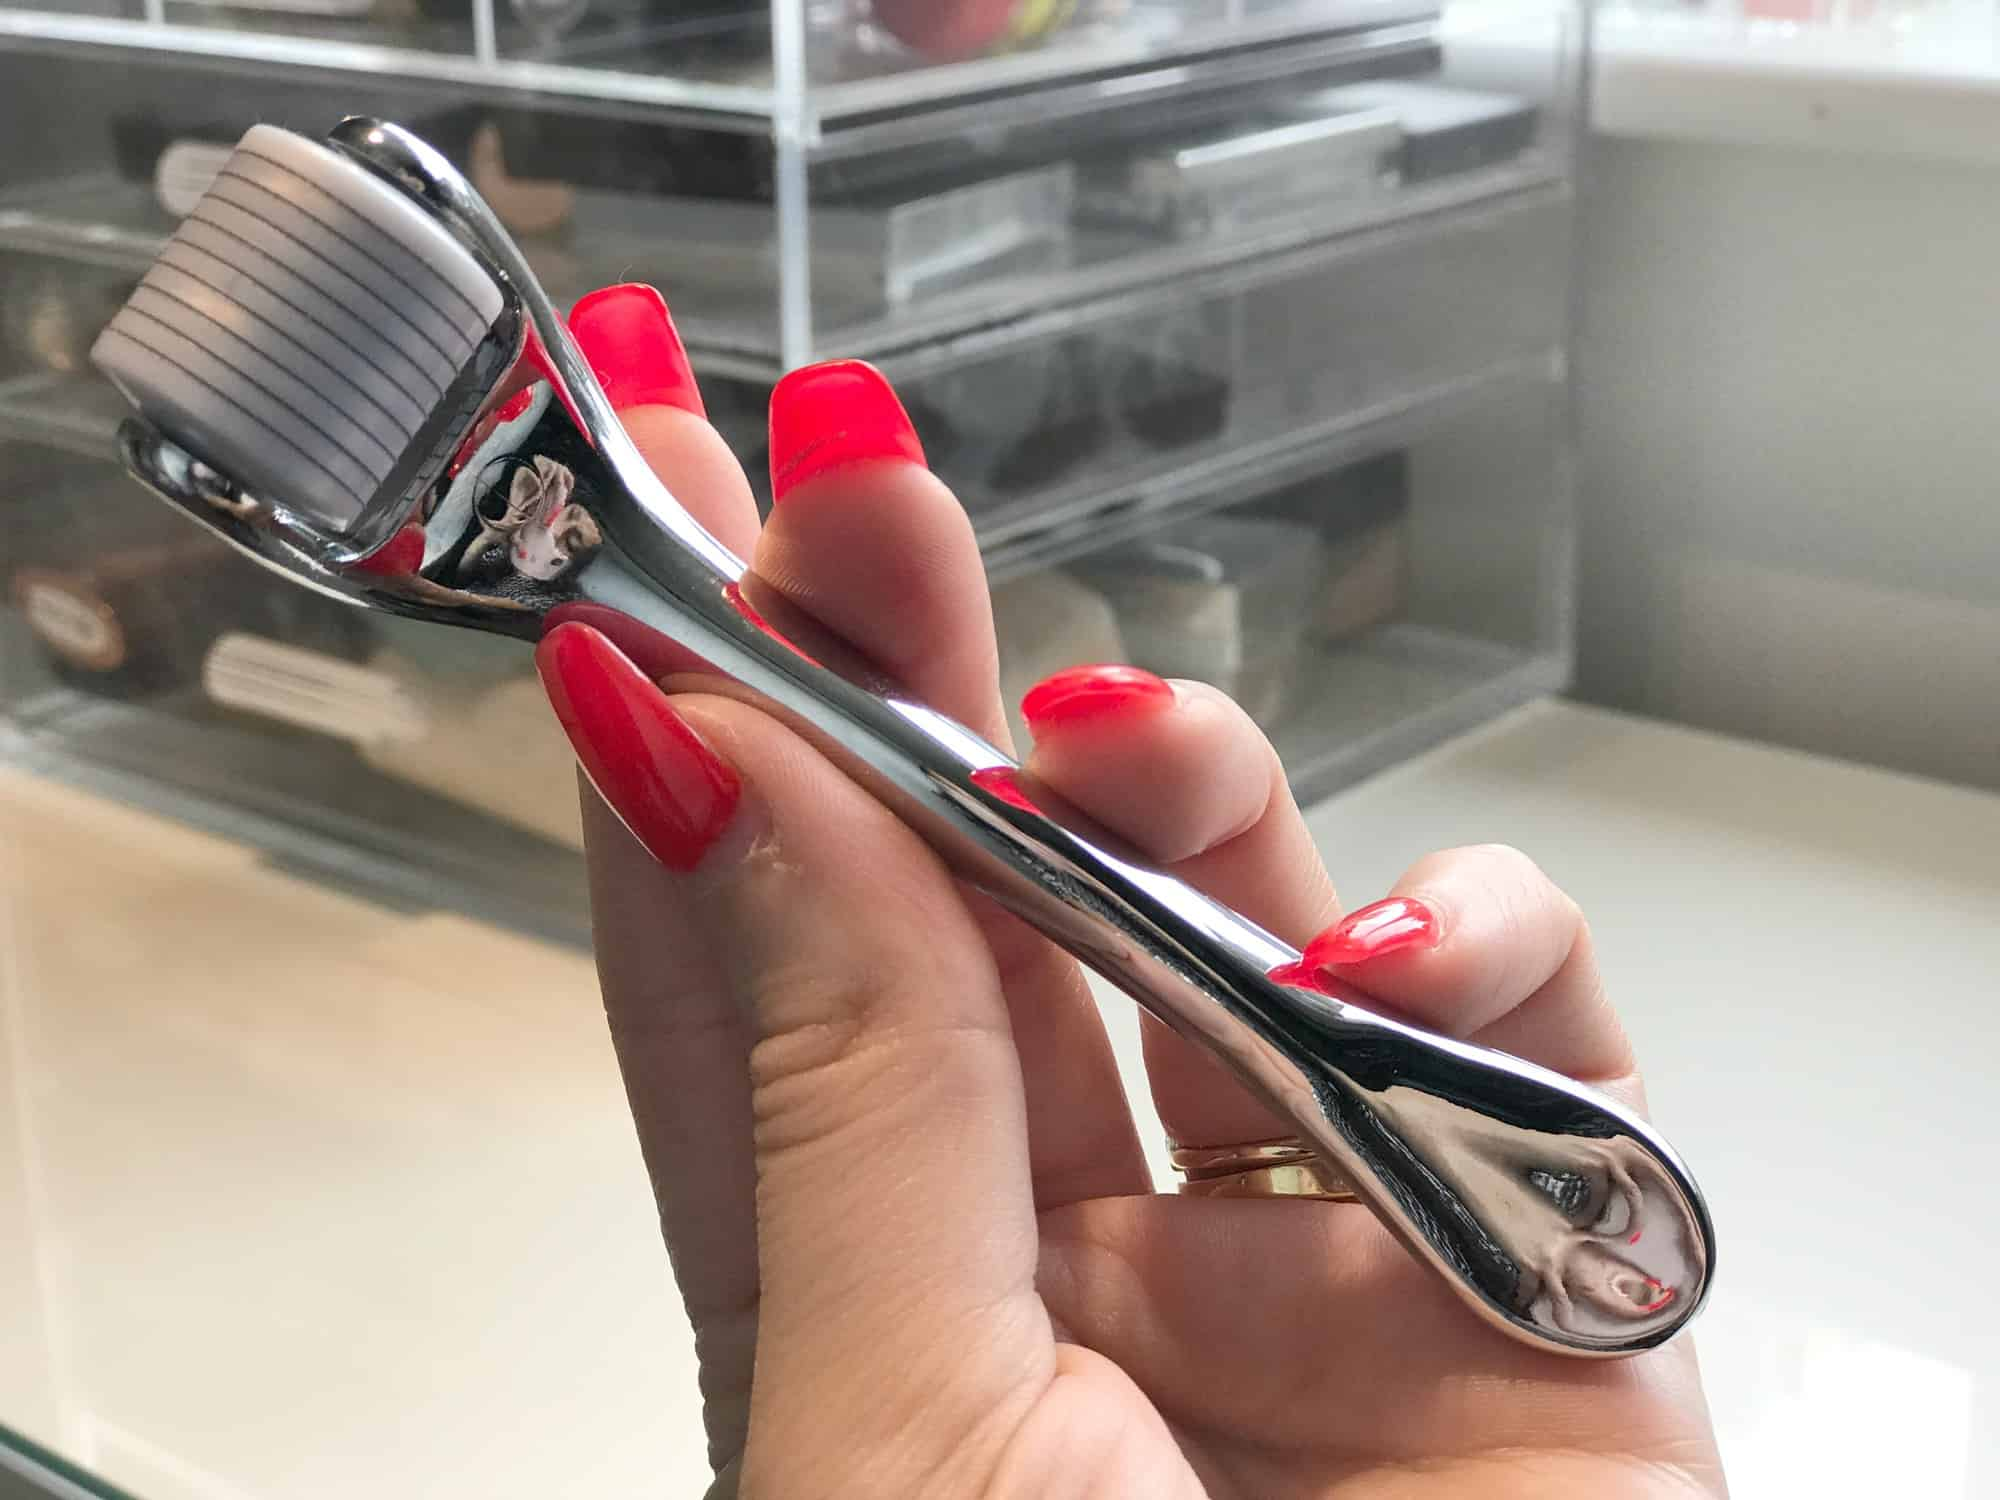 Swiss 0.2 micro needle roller